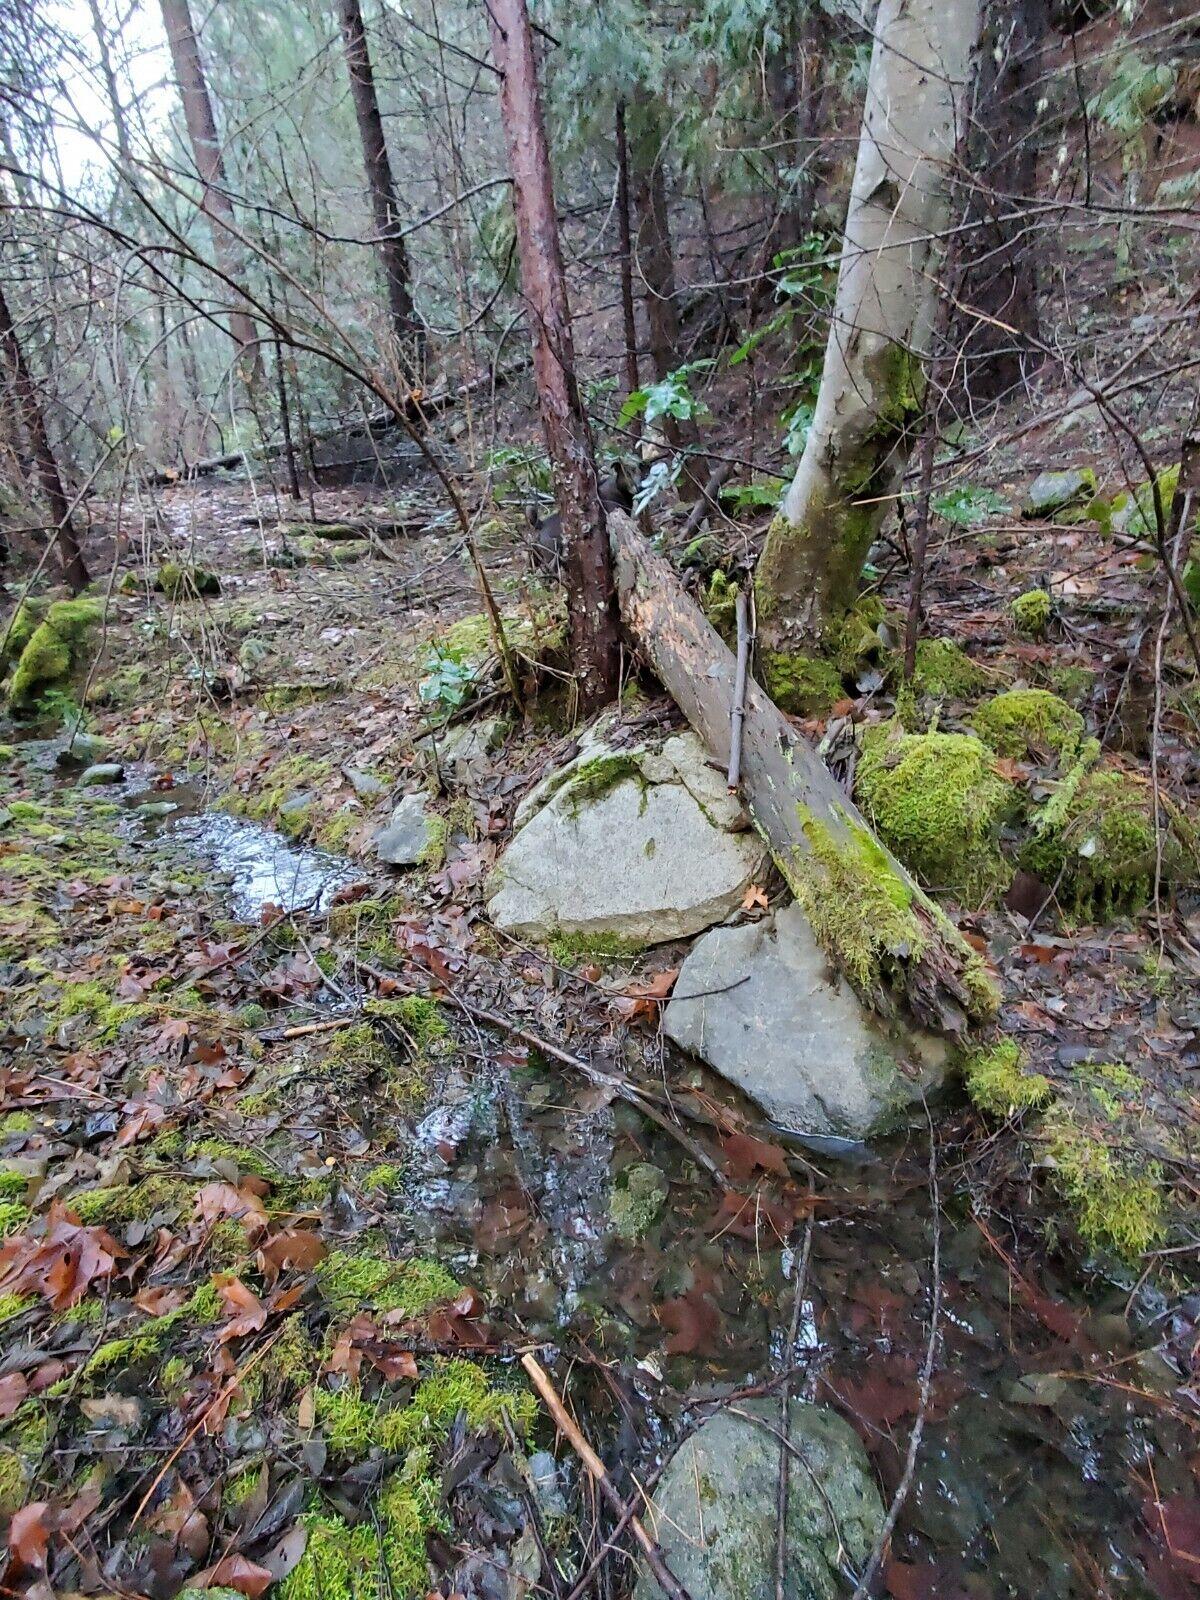 20 ACRE GOLD MINING CLAIM - Humbug Creek Siskiyou CALIFORNIA Fun Mine Land - $969.00